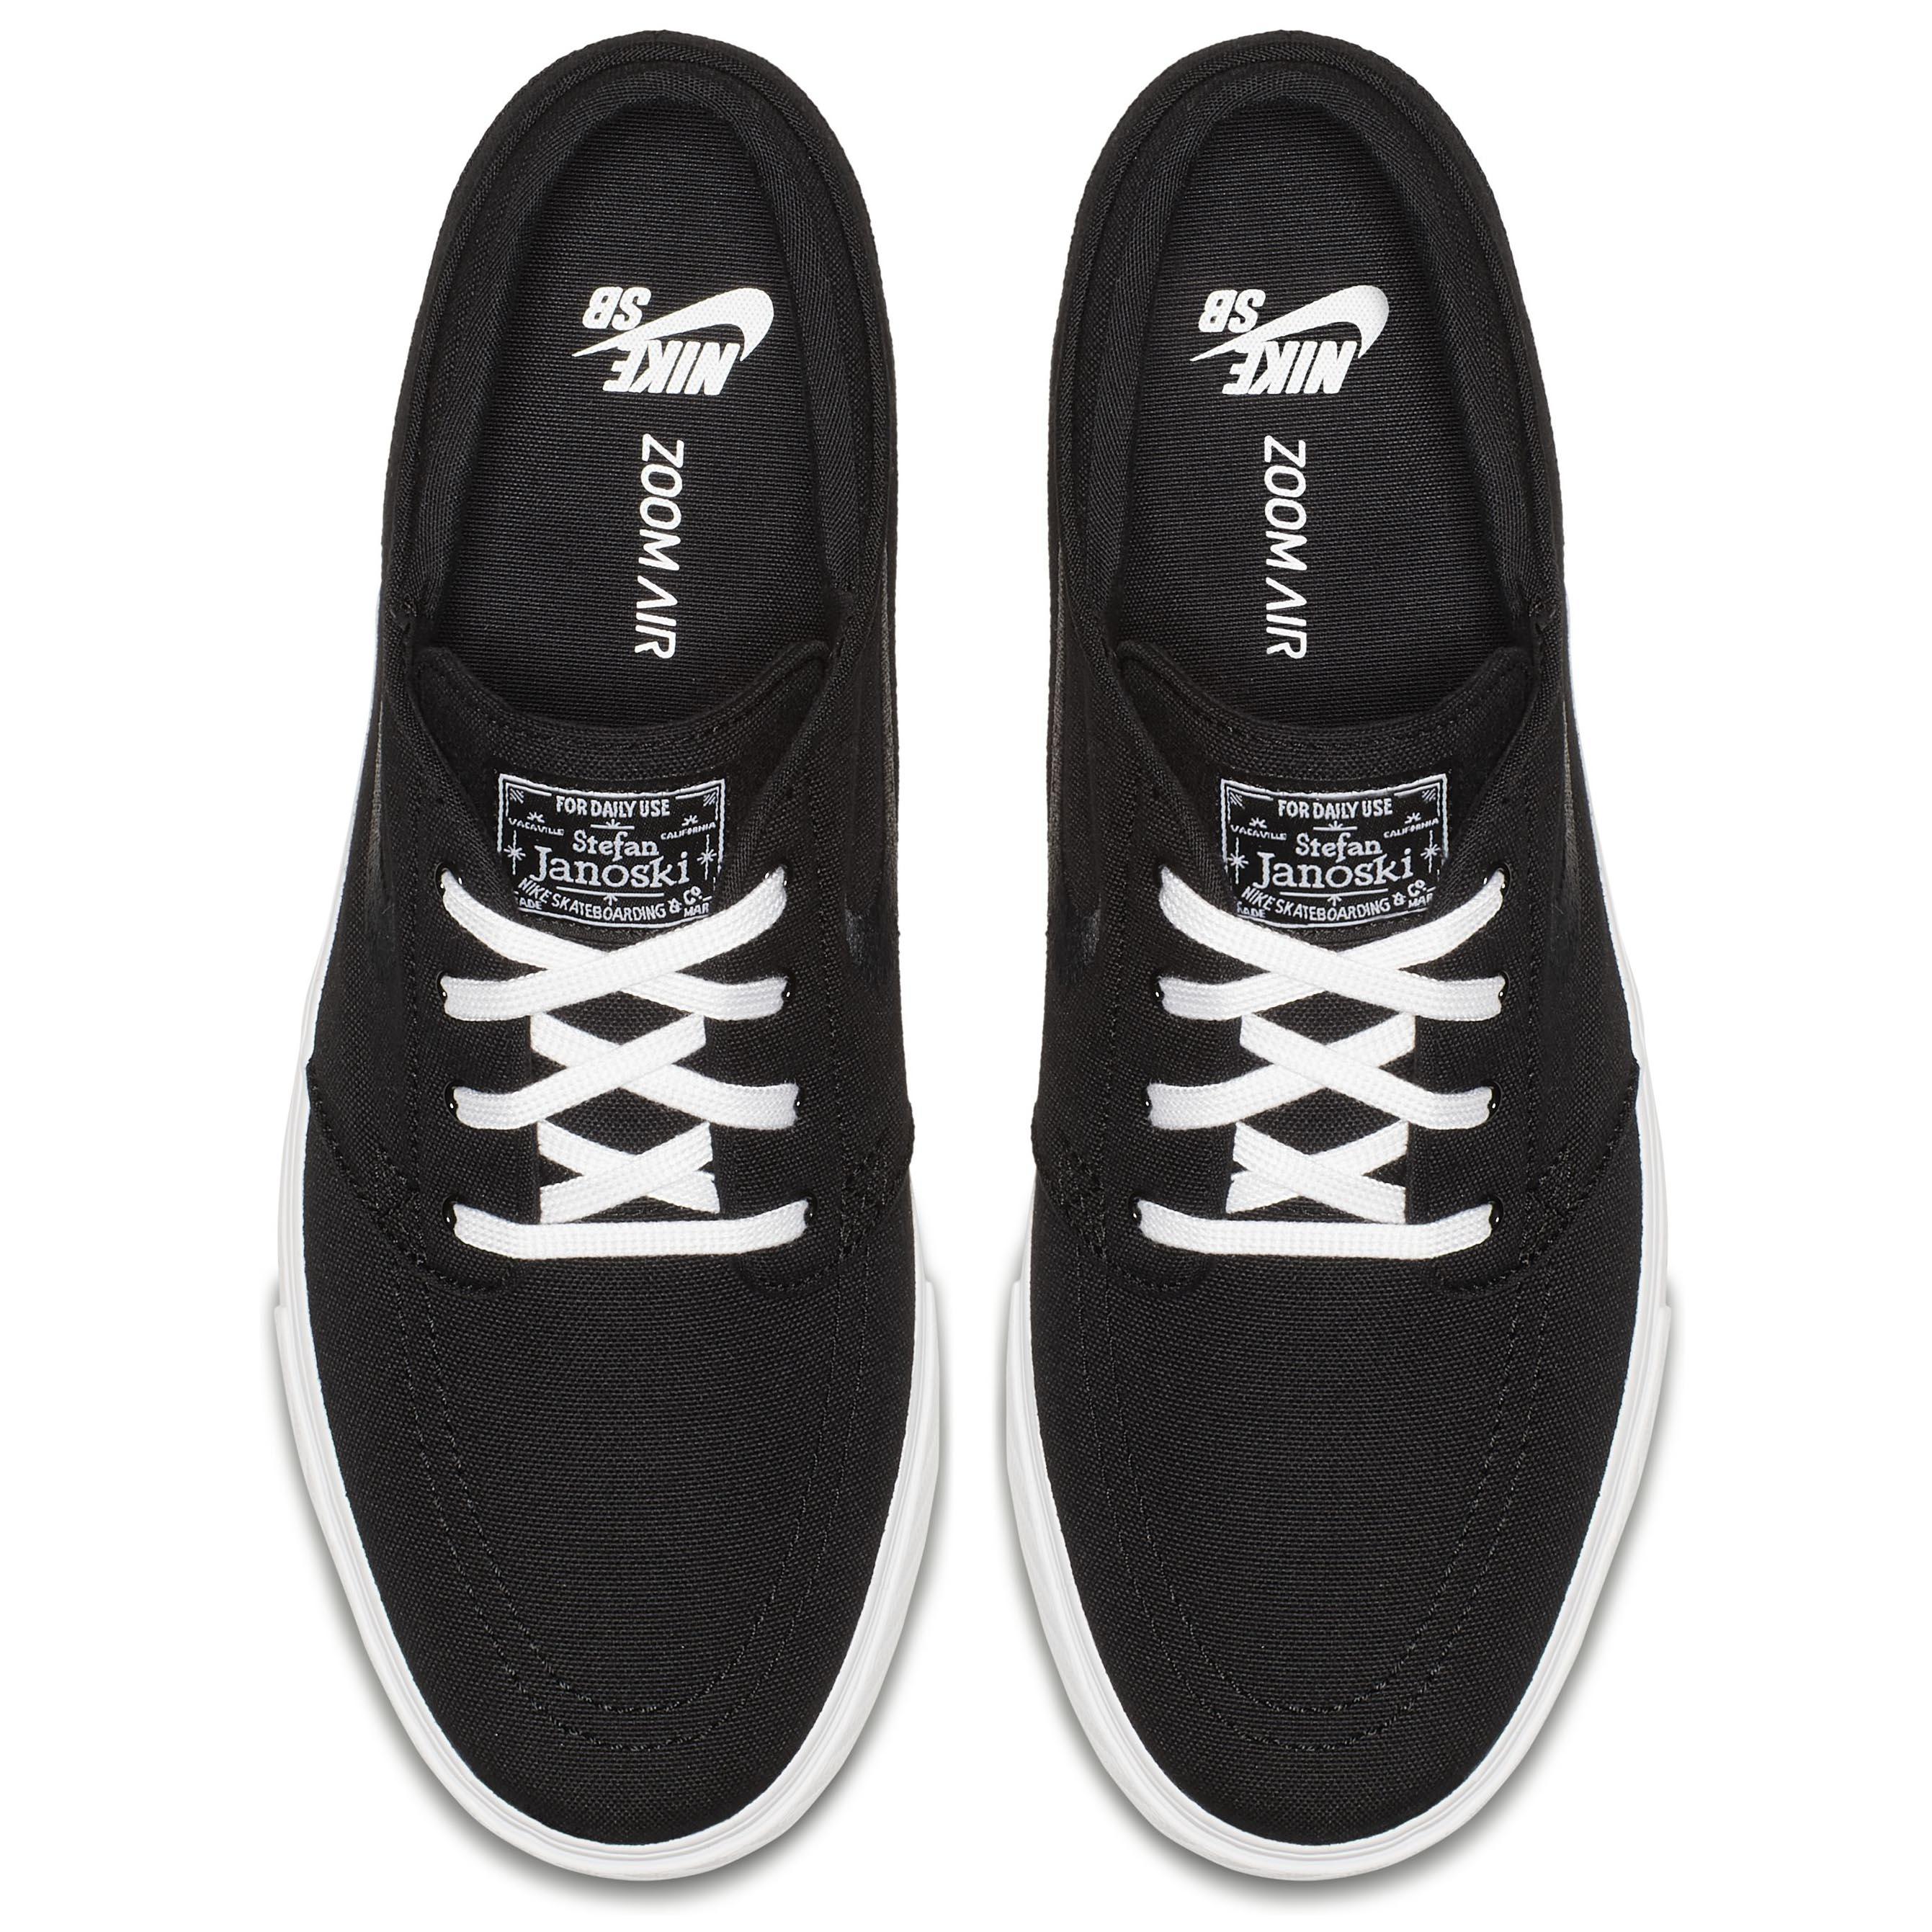 online store 31c49 07322 Мужские кеды Nike SB Zoom Stefan Janoski Canvas Black Black-White - фото 3